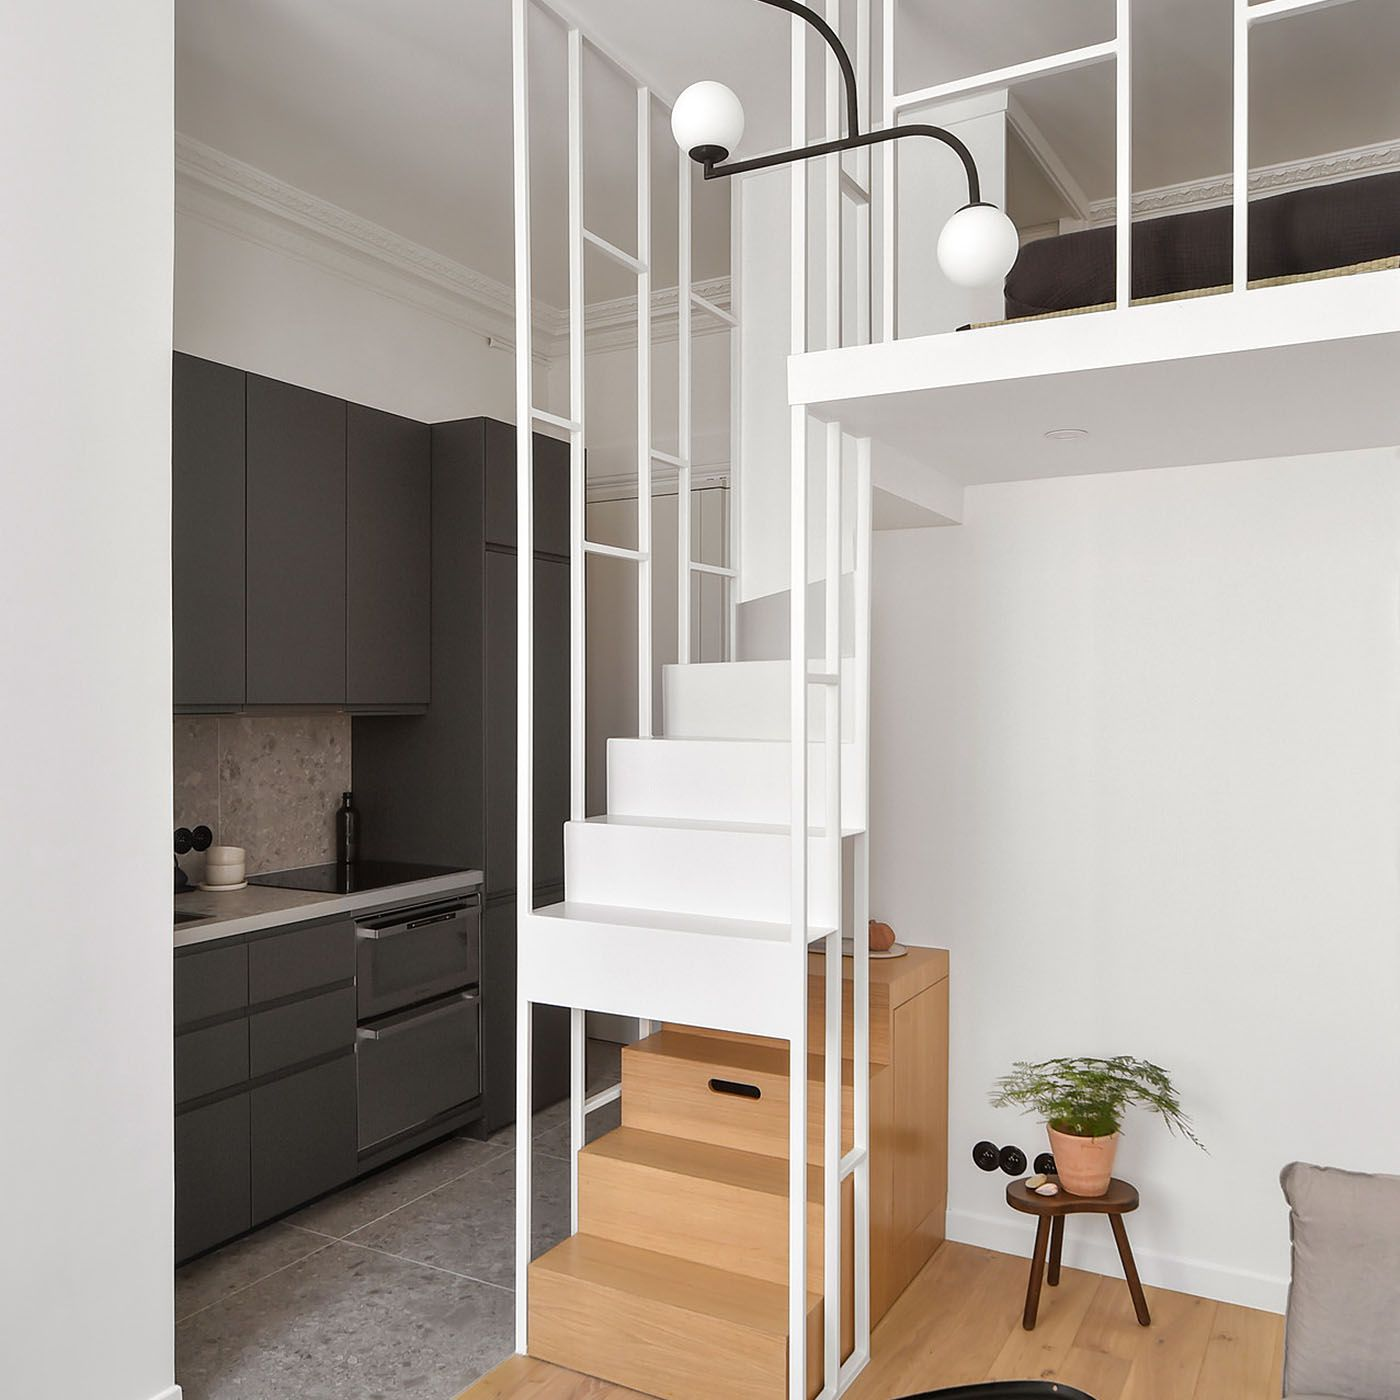 Boulevard Arago apartment renovation Studio Beau Faire staircase and kitchen